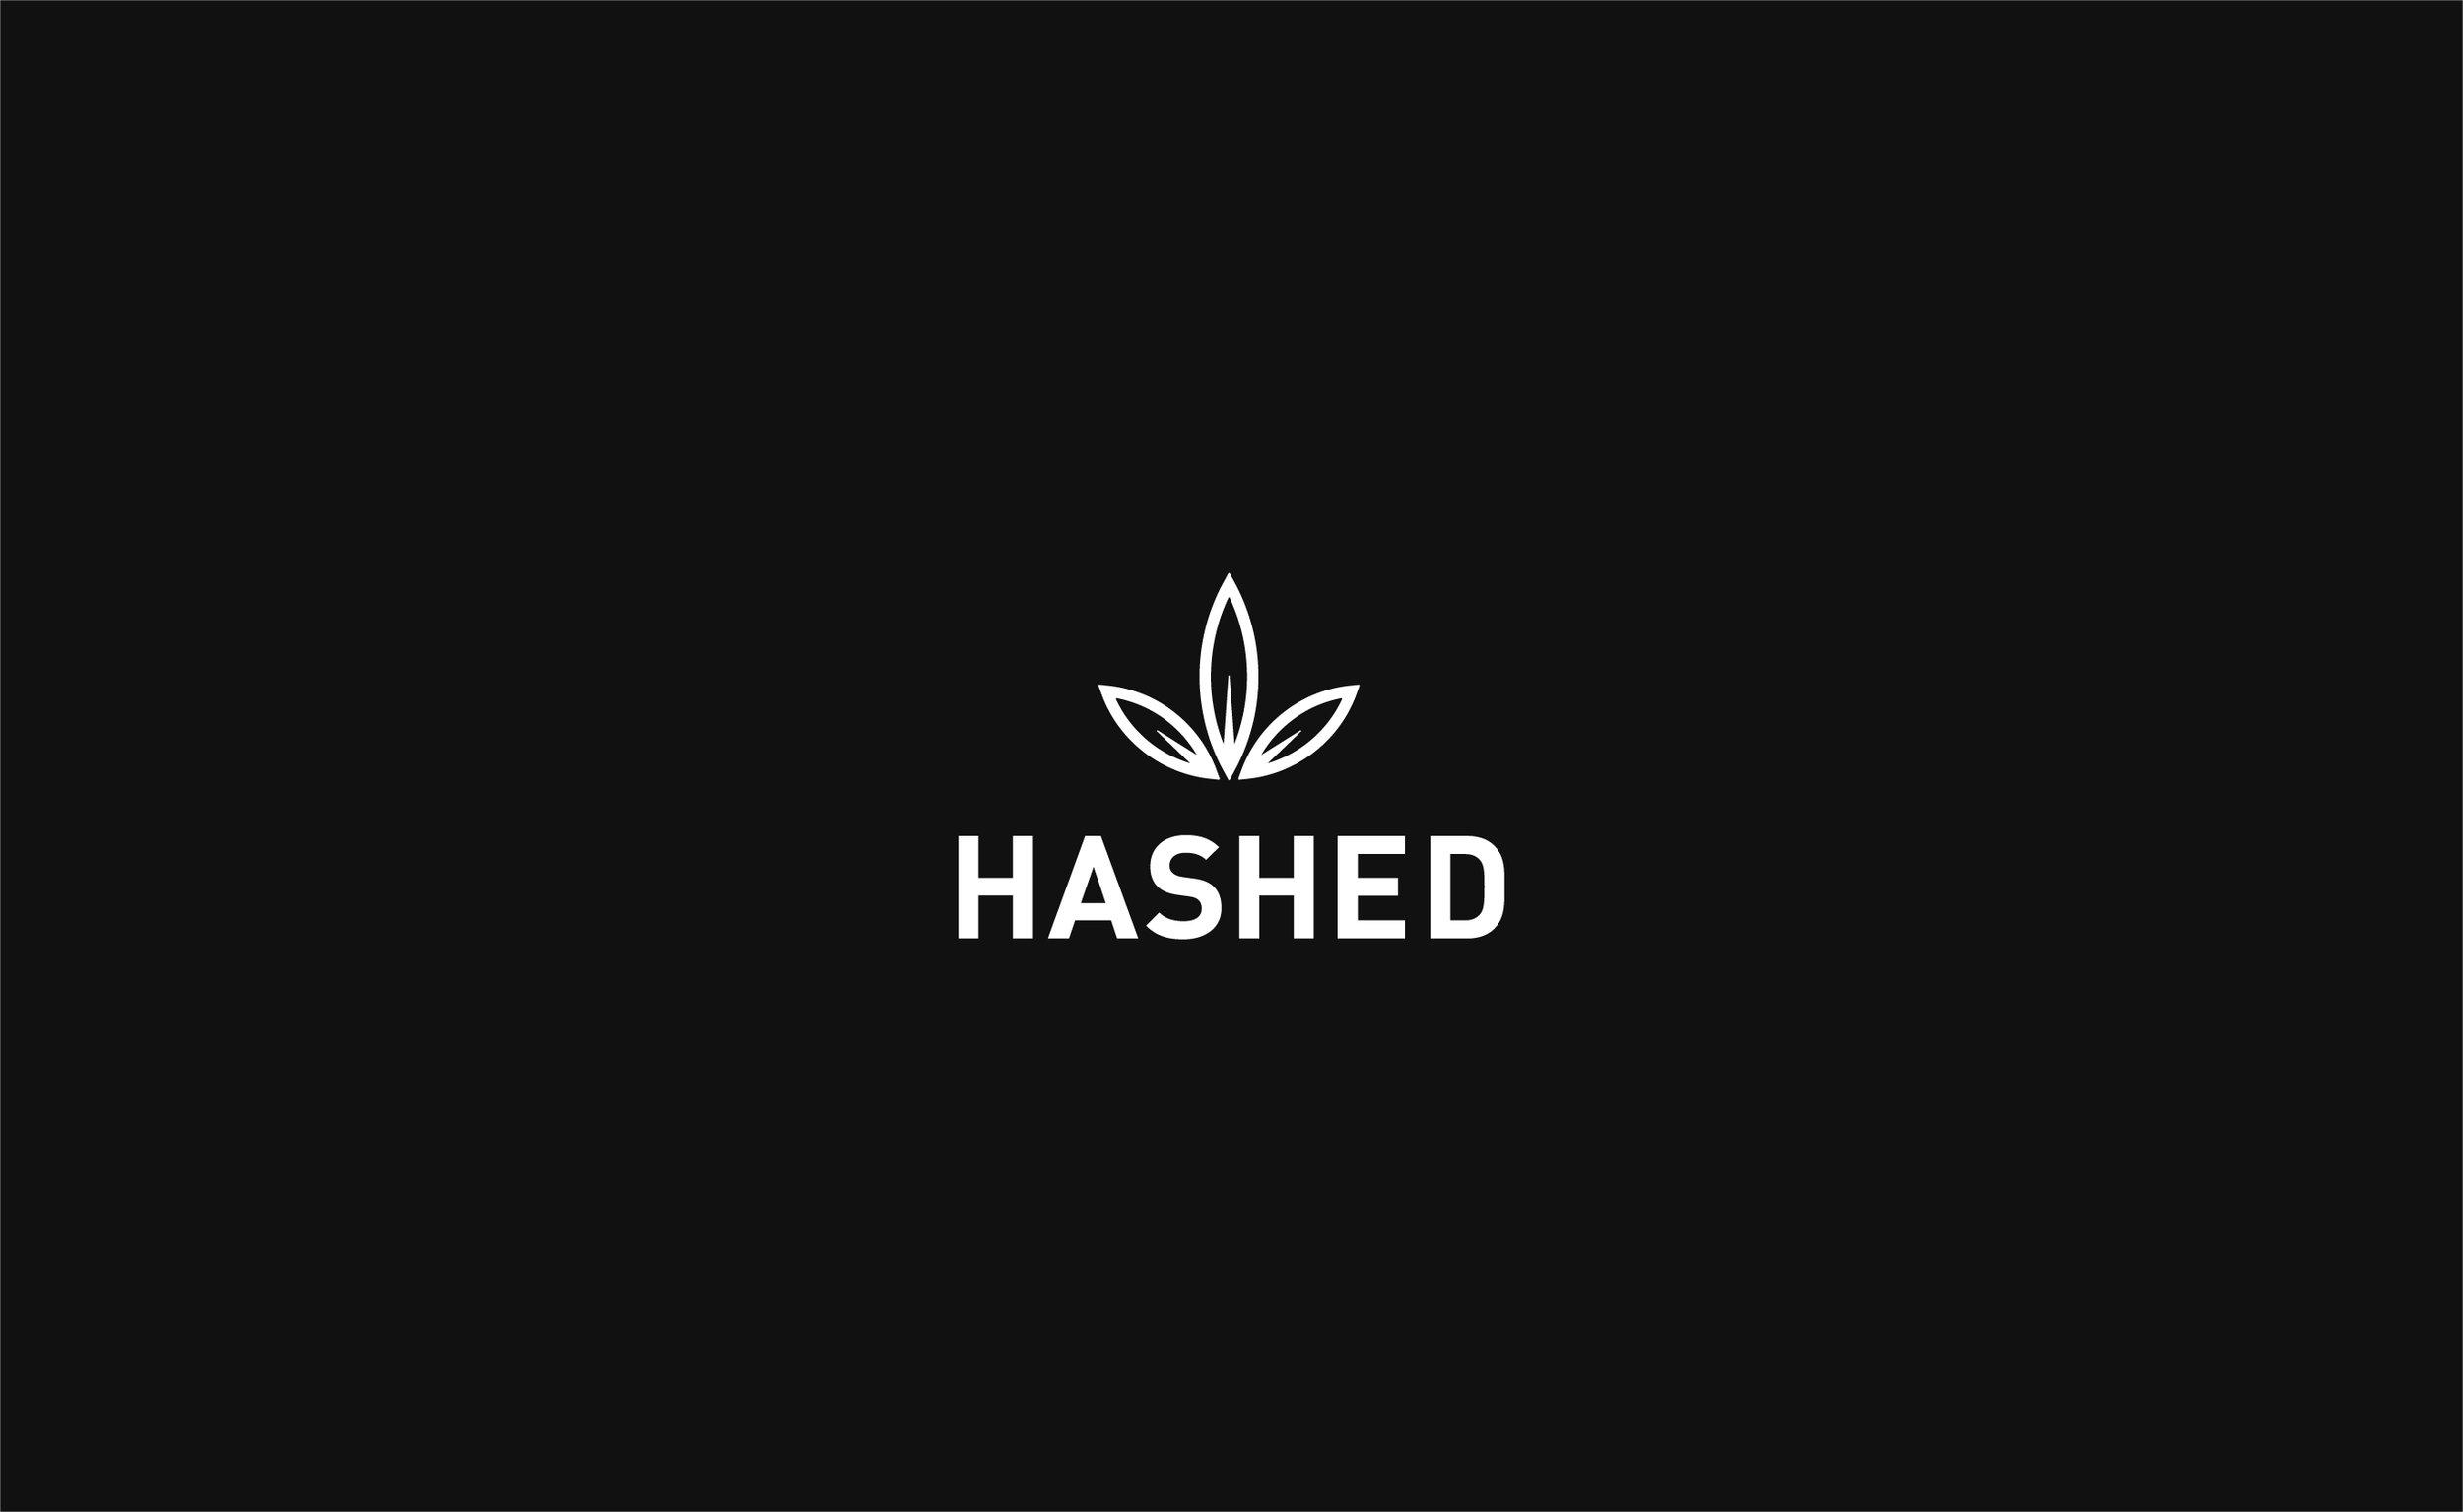 hashed_cannabis_brand.jpg